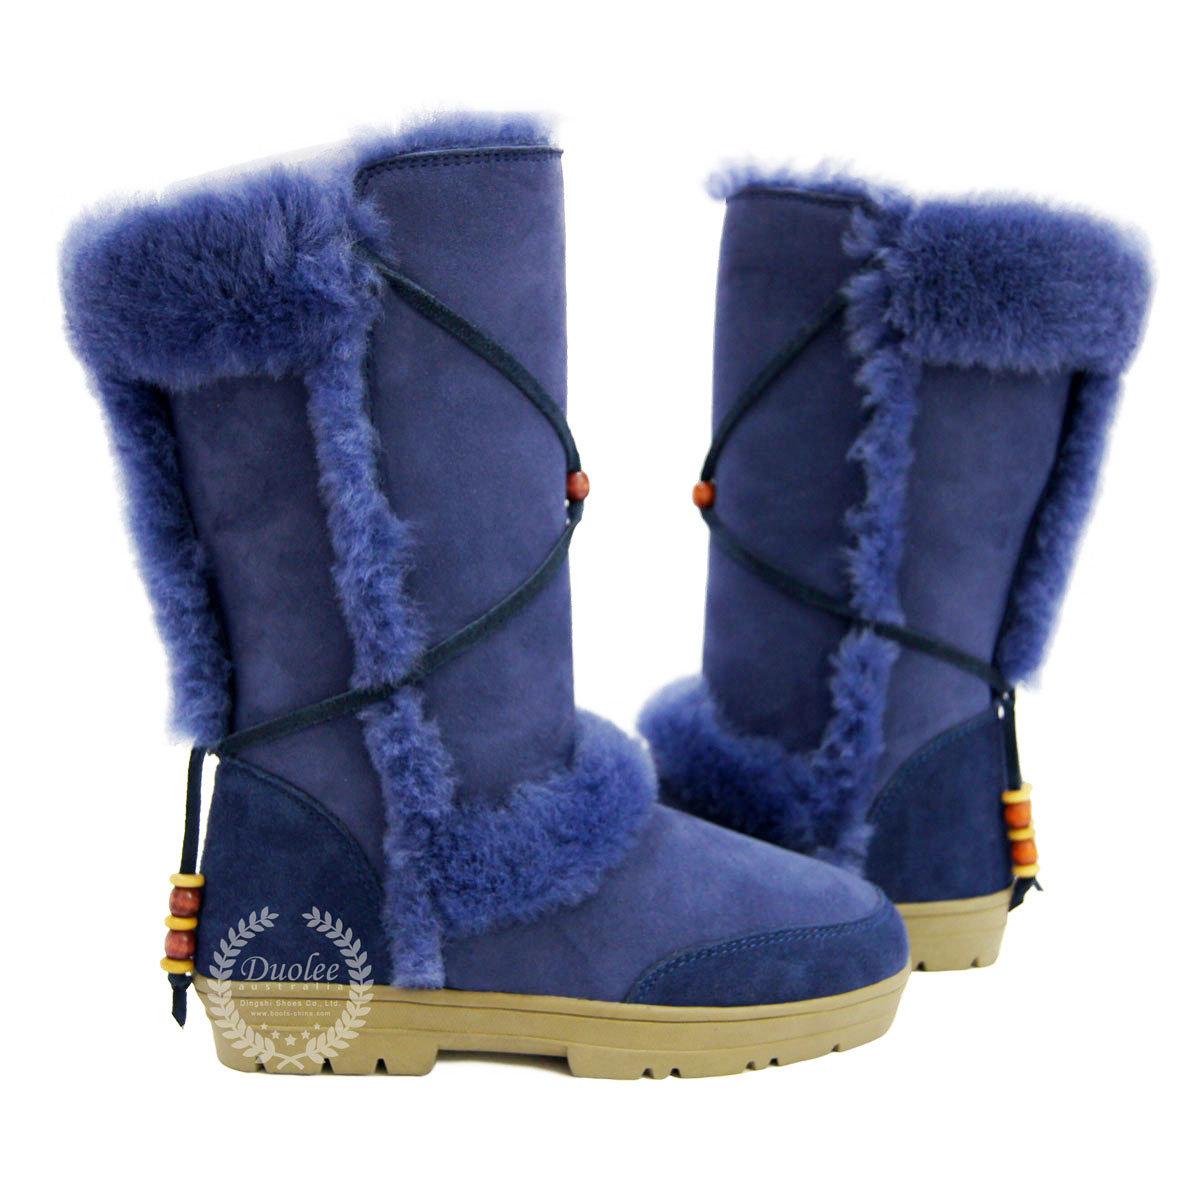 leather sheepskin winter boots mount mercy